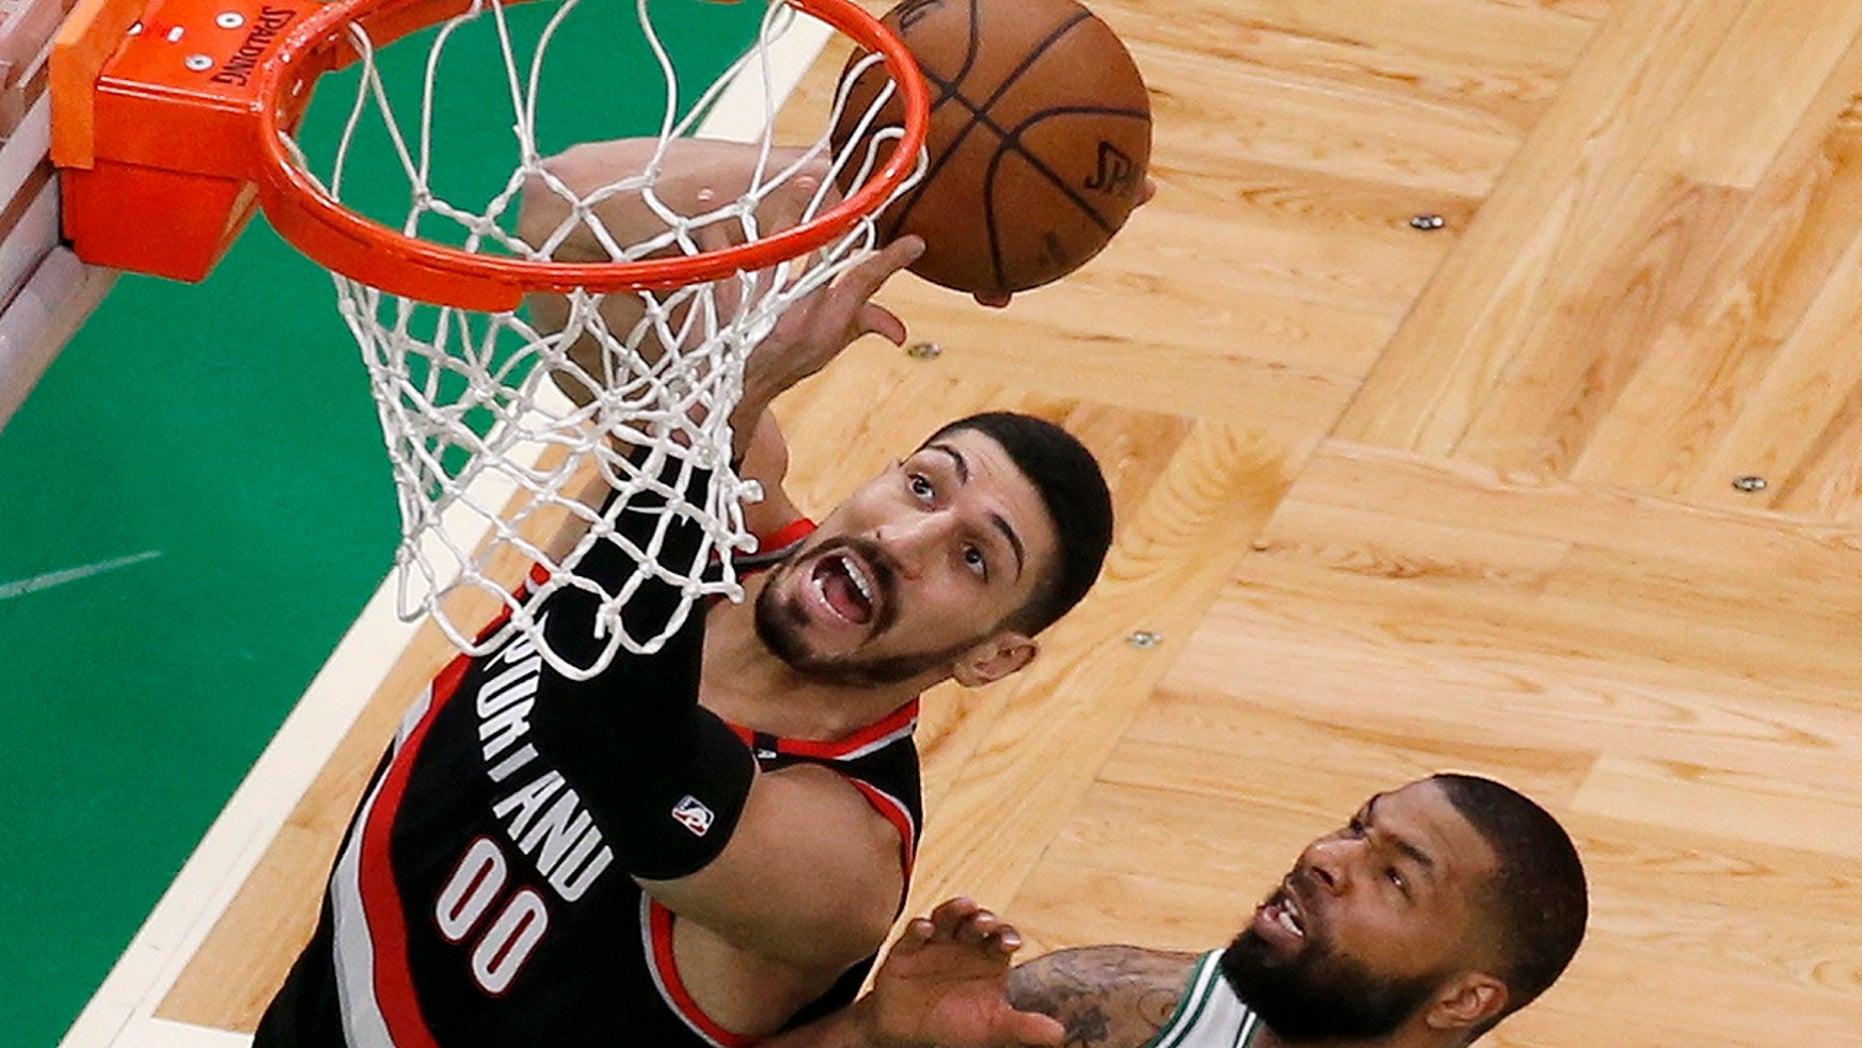 Portland Trail Blazers center Enes Kanter, left, drives to the basket against Boston Celtics forward Marcus Morris during an NBA basketball game, Feb. 27, 2019, in Boston. (Associated Press)